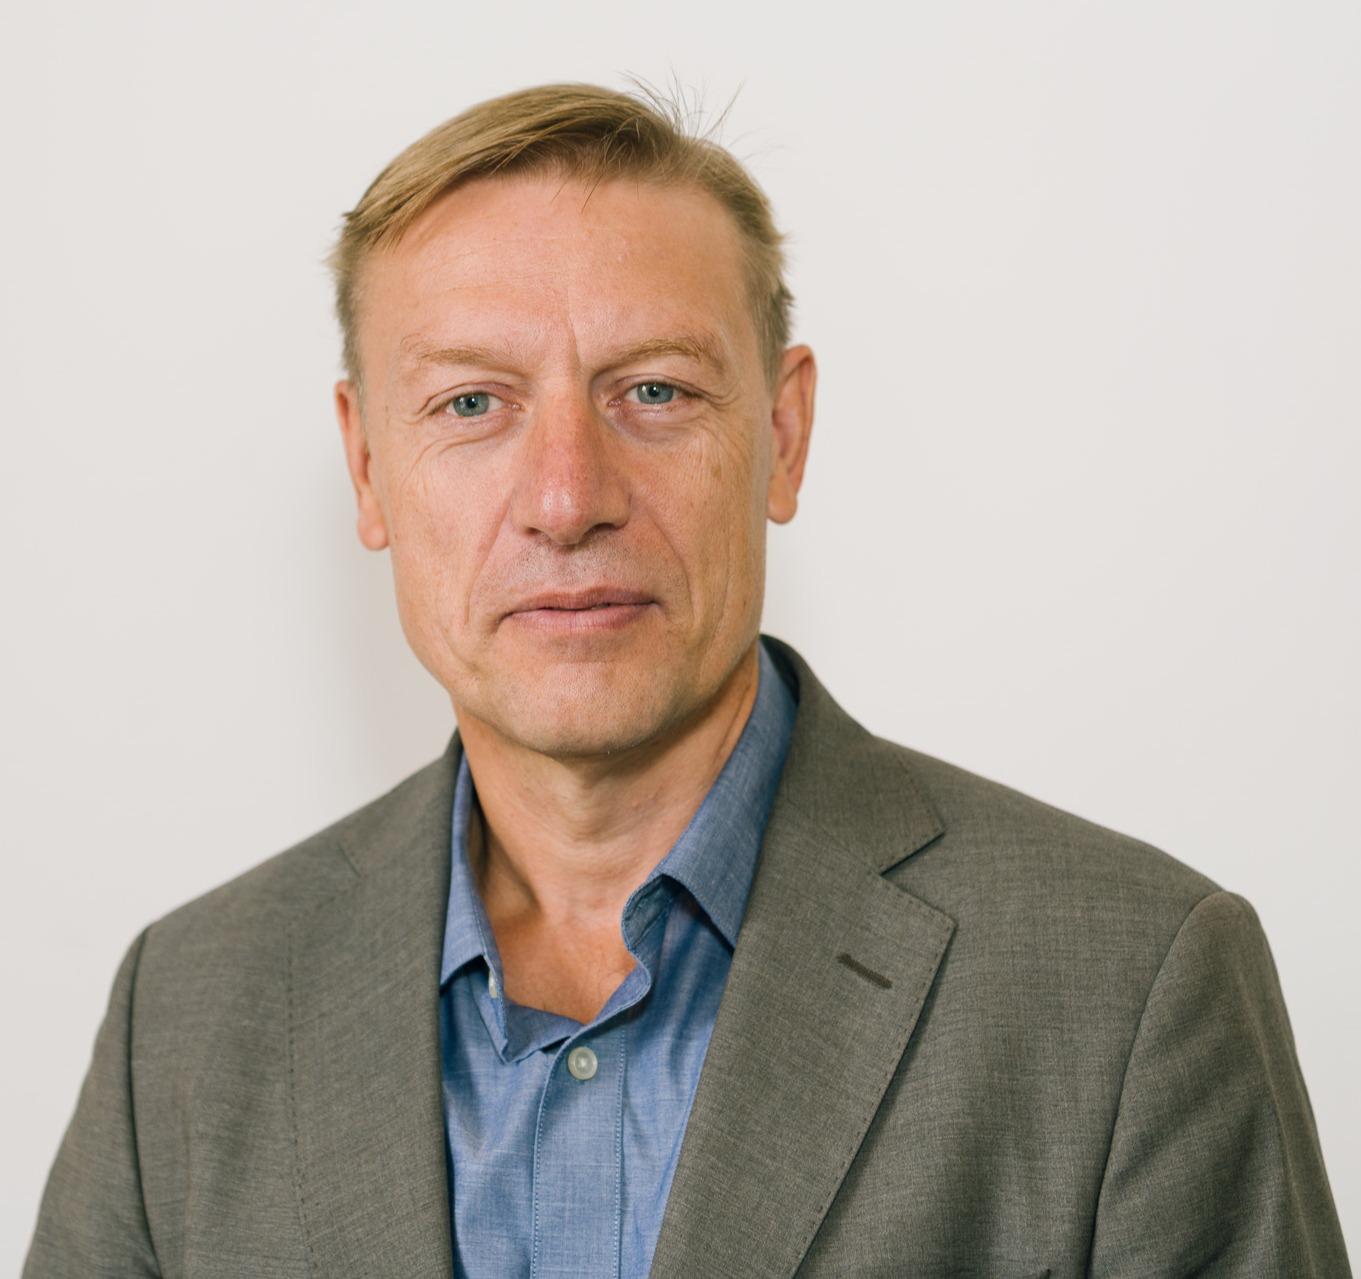 Johan Källgren